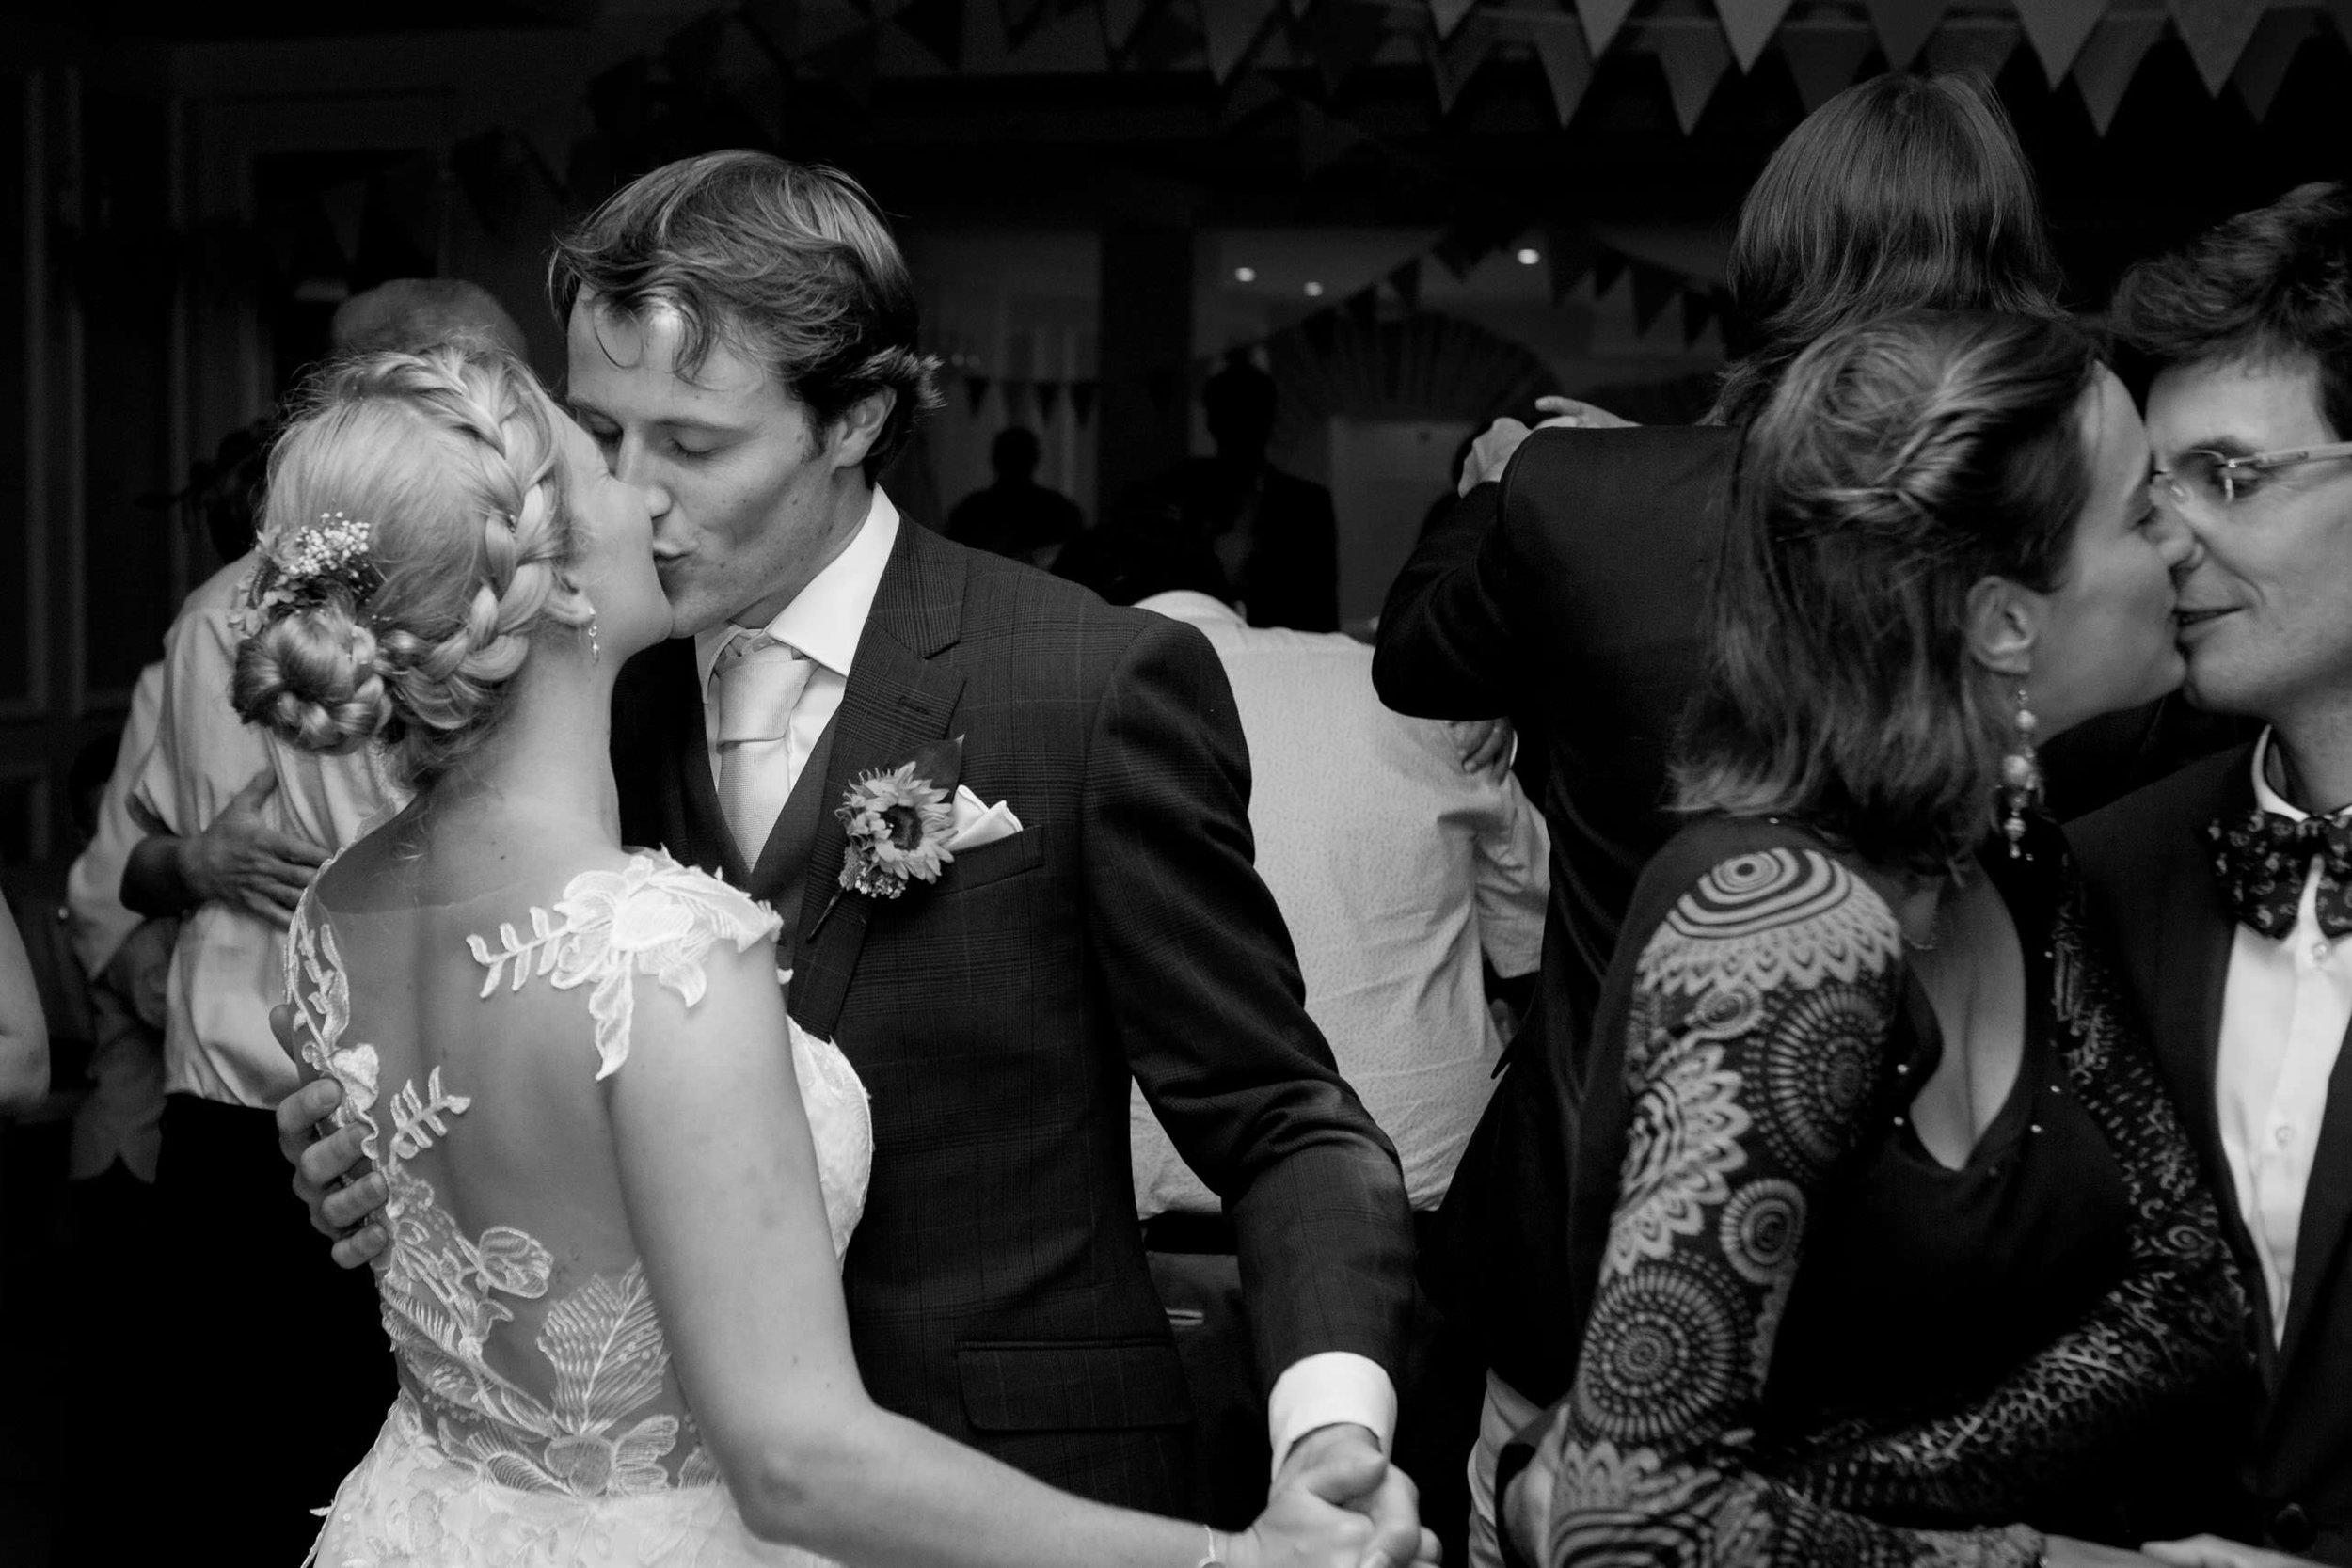 Bucklands-Tout-Saints-Devon-Wedding-Photography (17).jpg